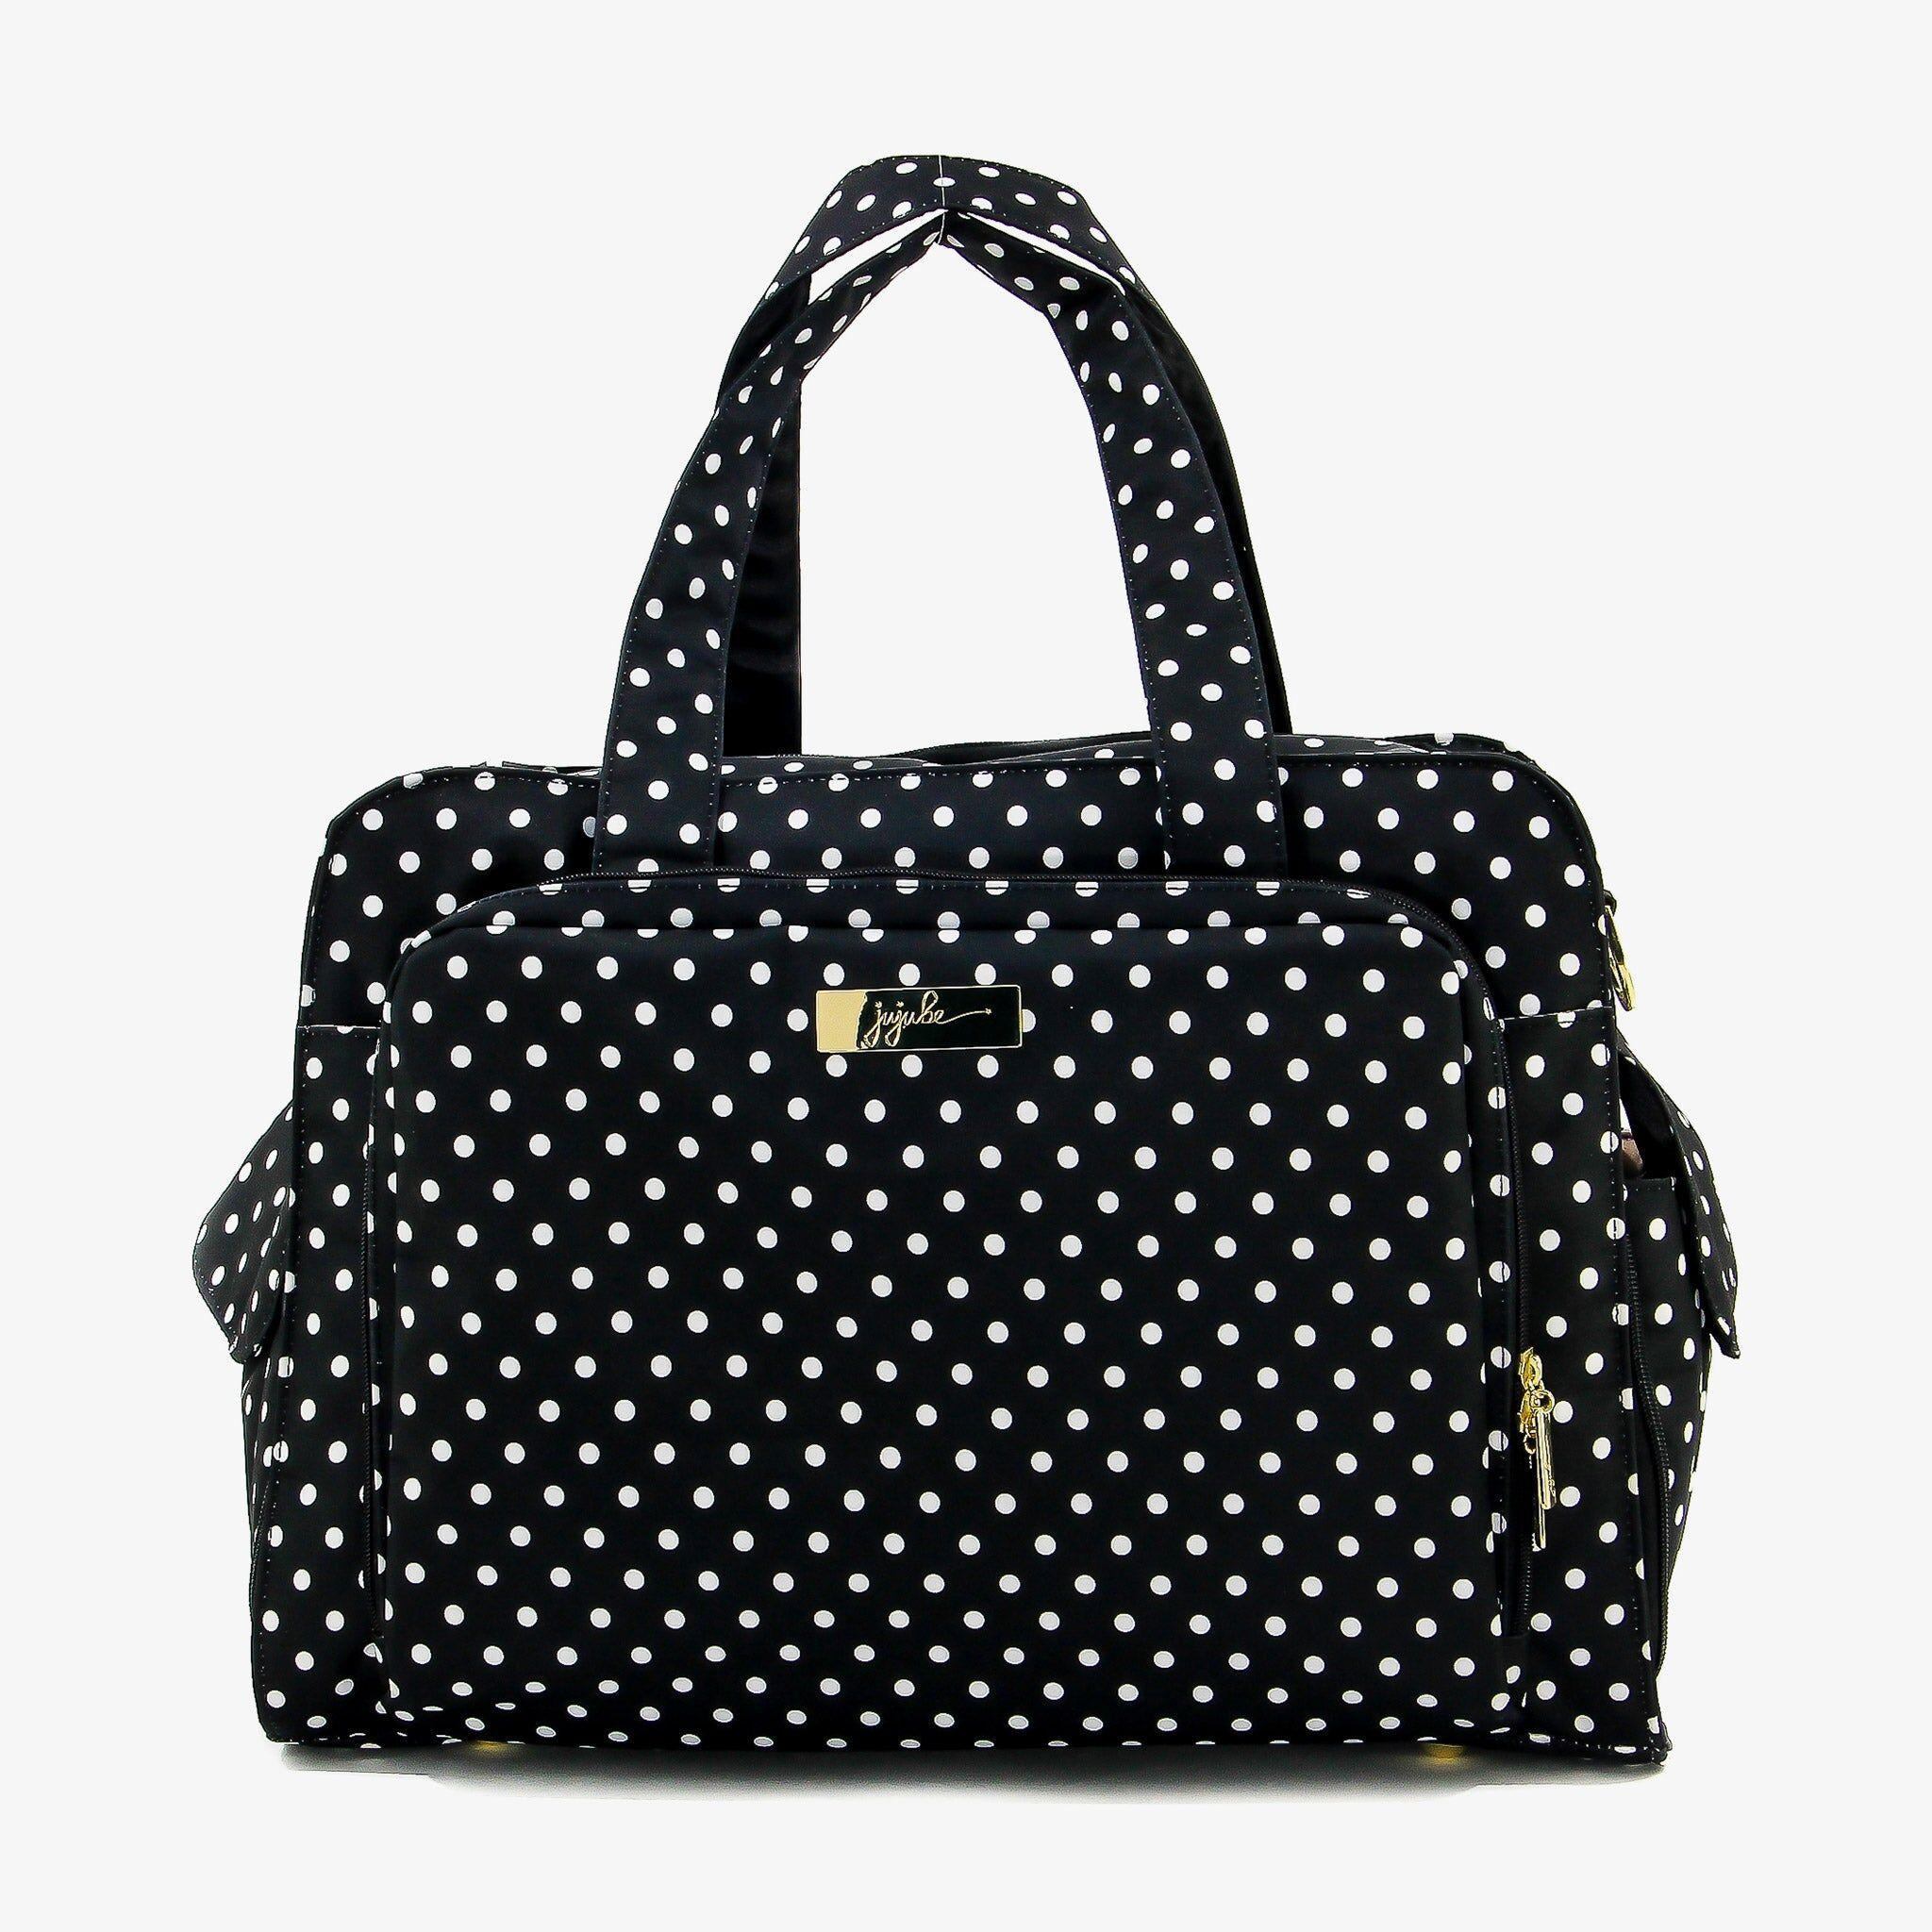 JuJuBe Be Prepared Diaper Bag - The Duchess